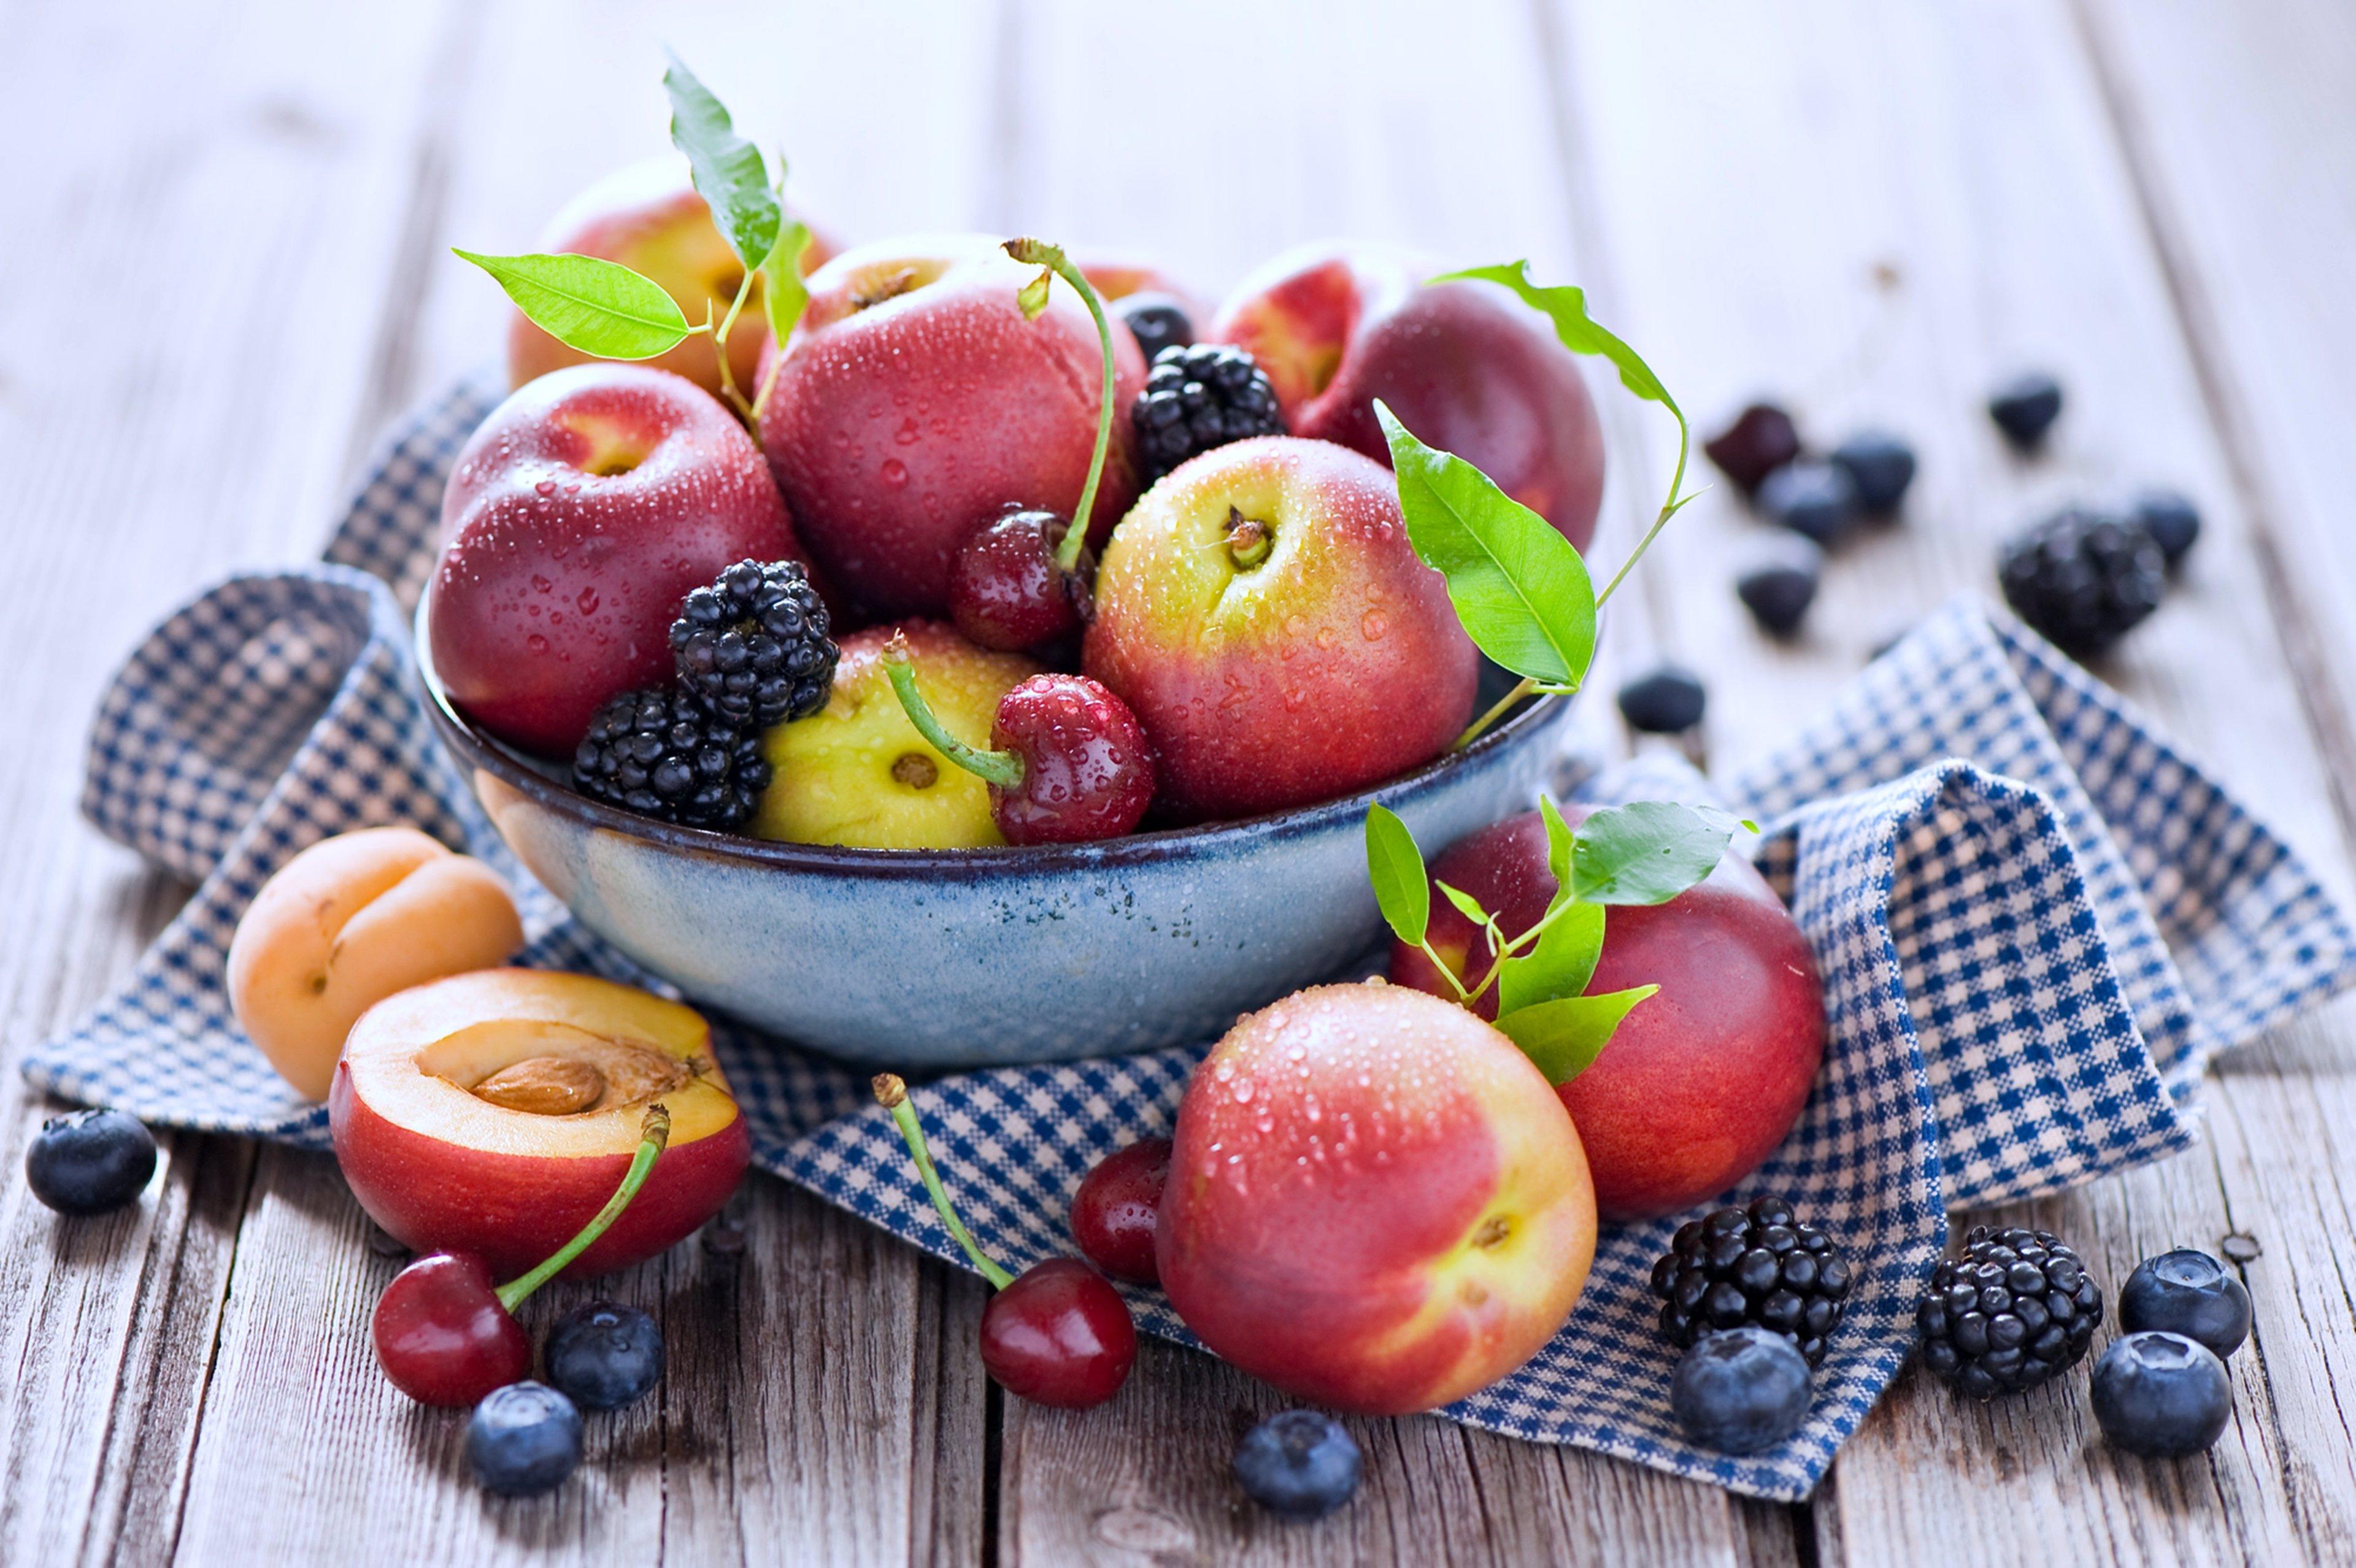 fruits basket wallpapers download